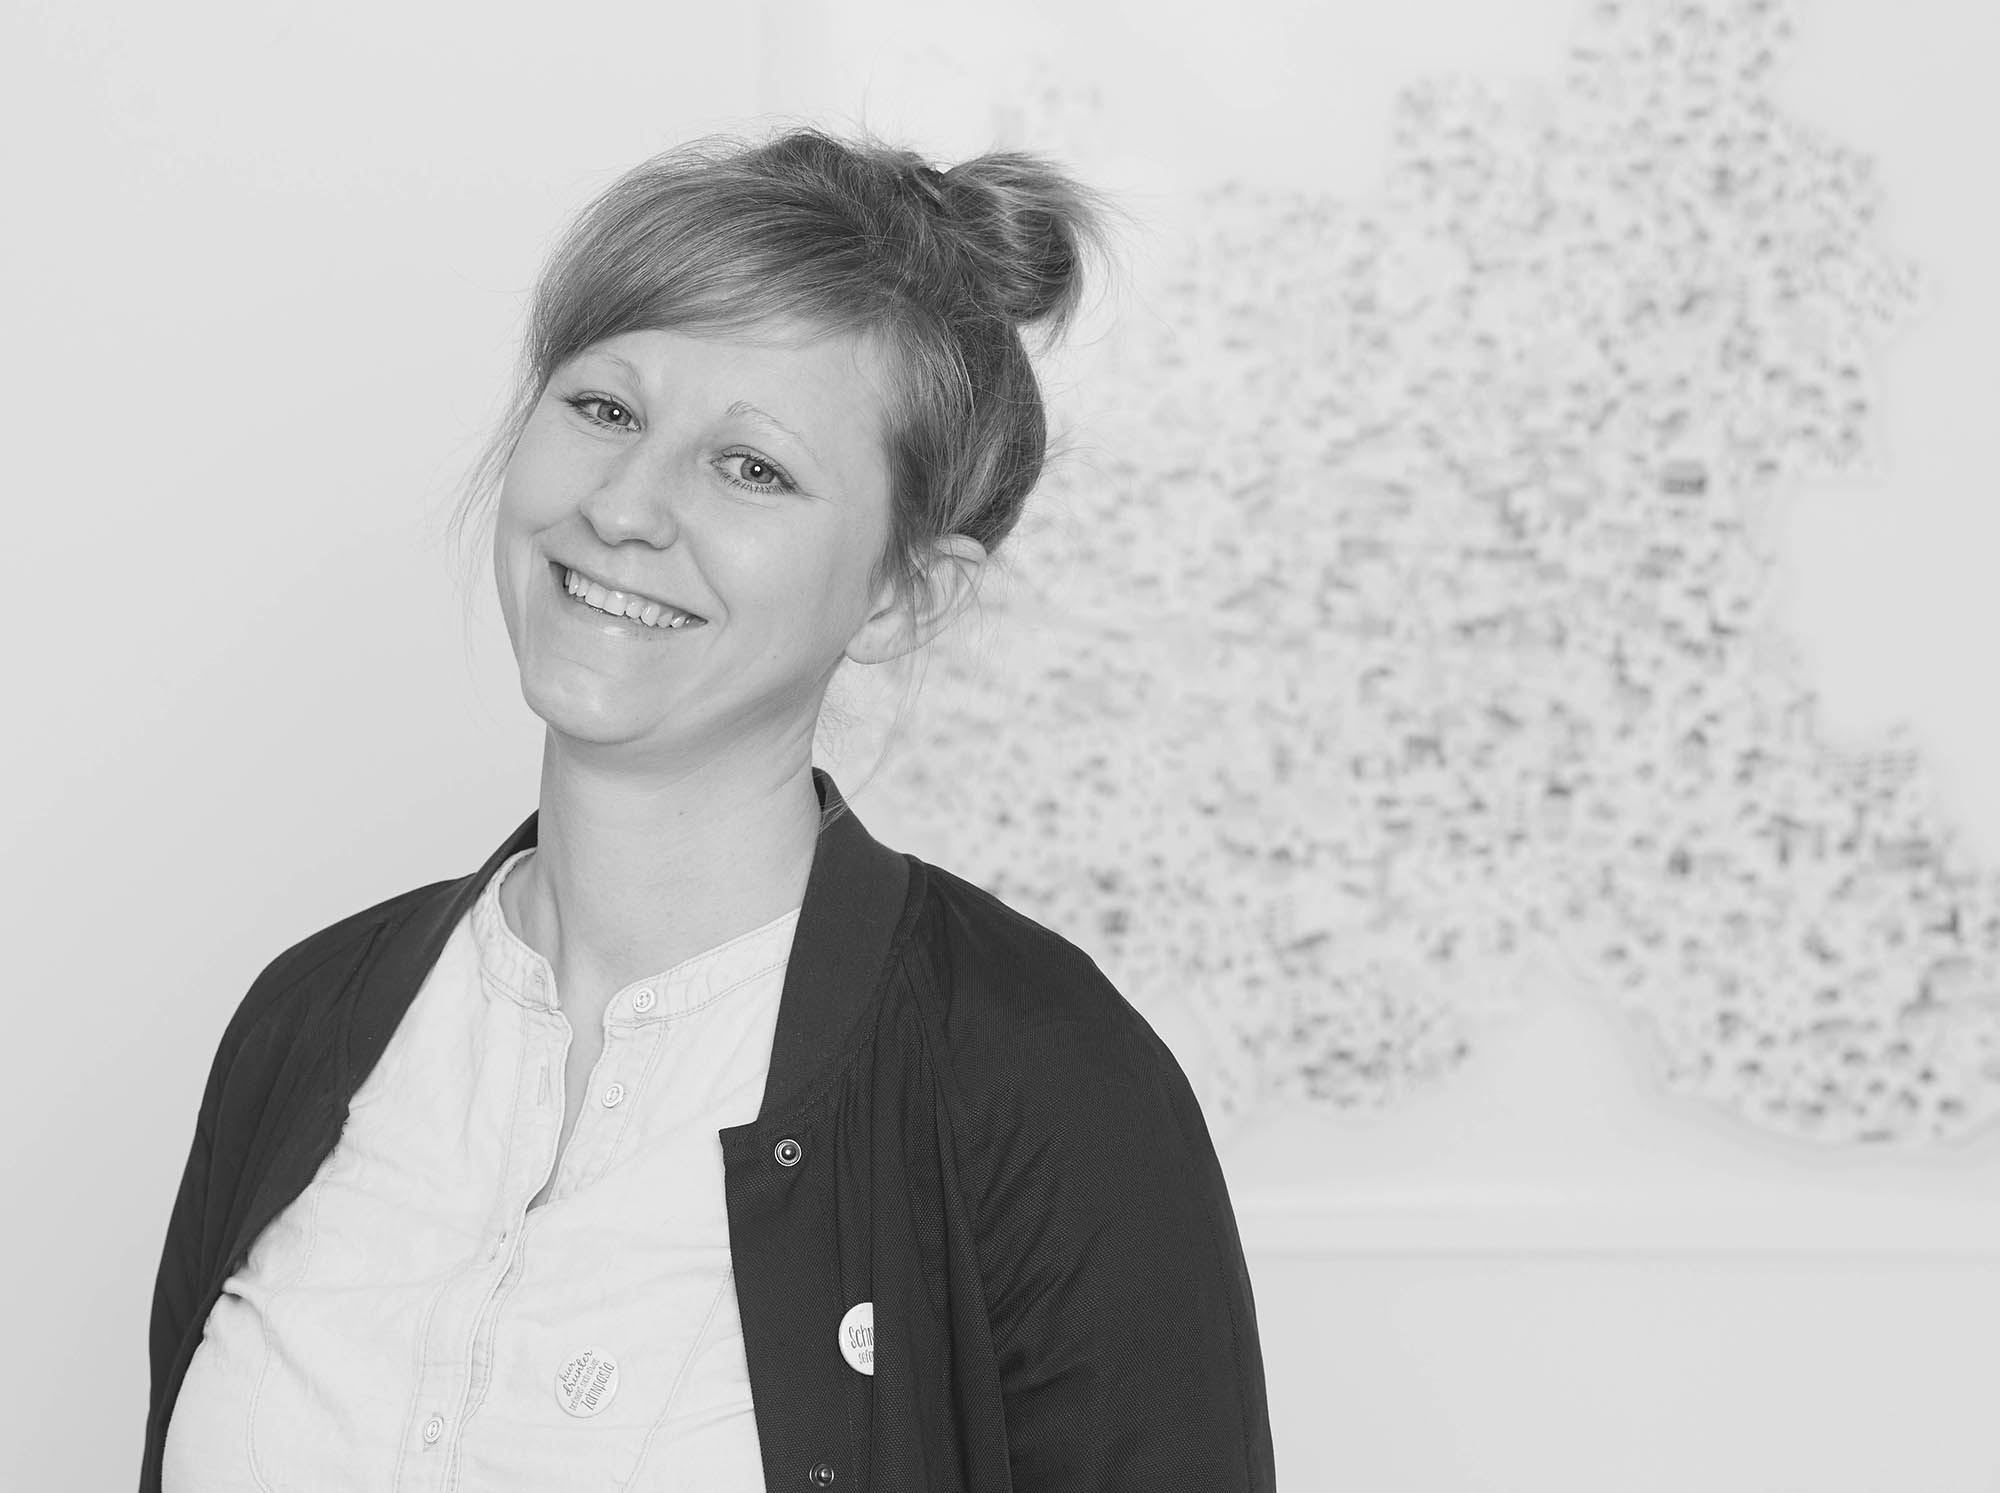 Martina Olonschek Frau Schnobel Grafik Rapü Design Portrait